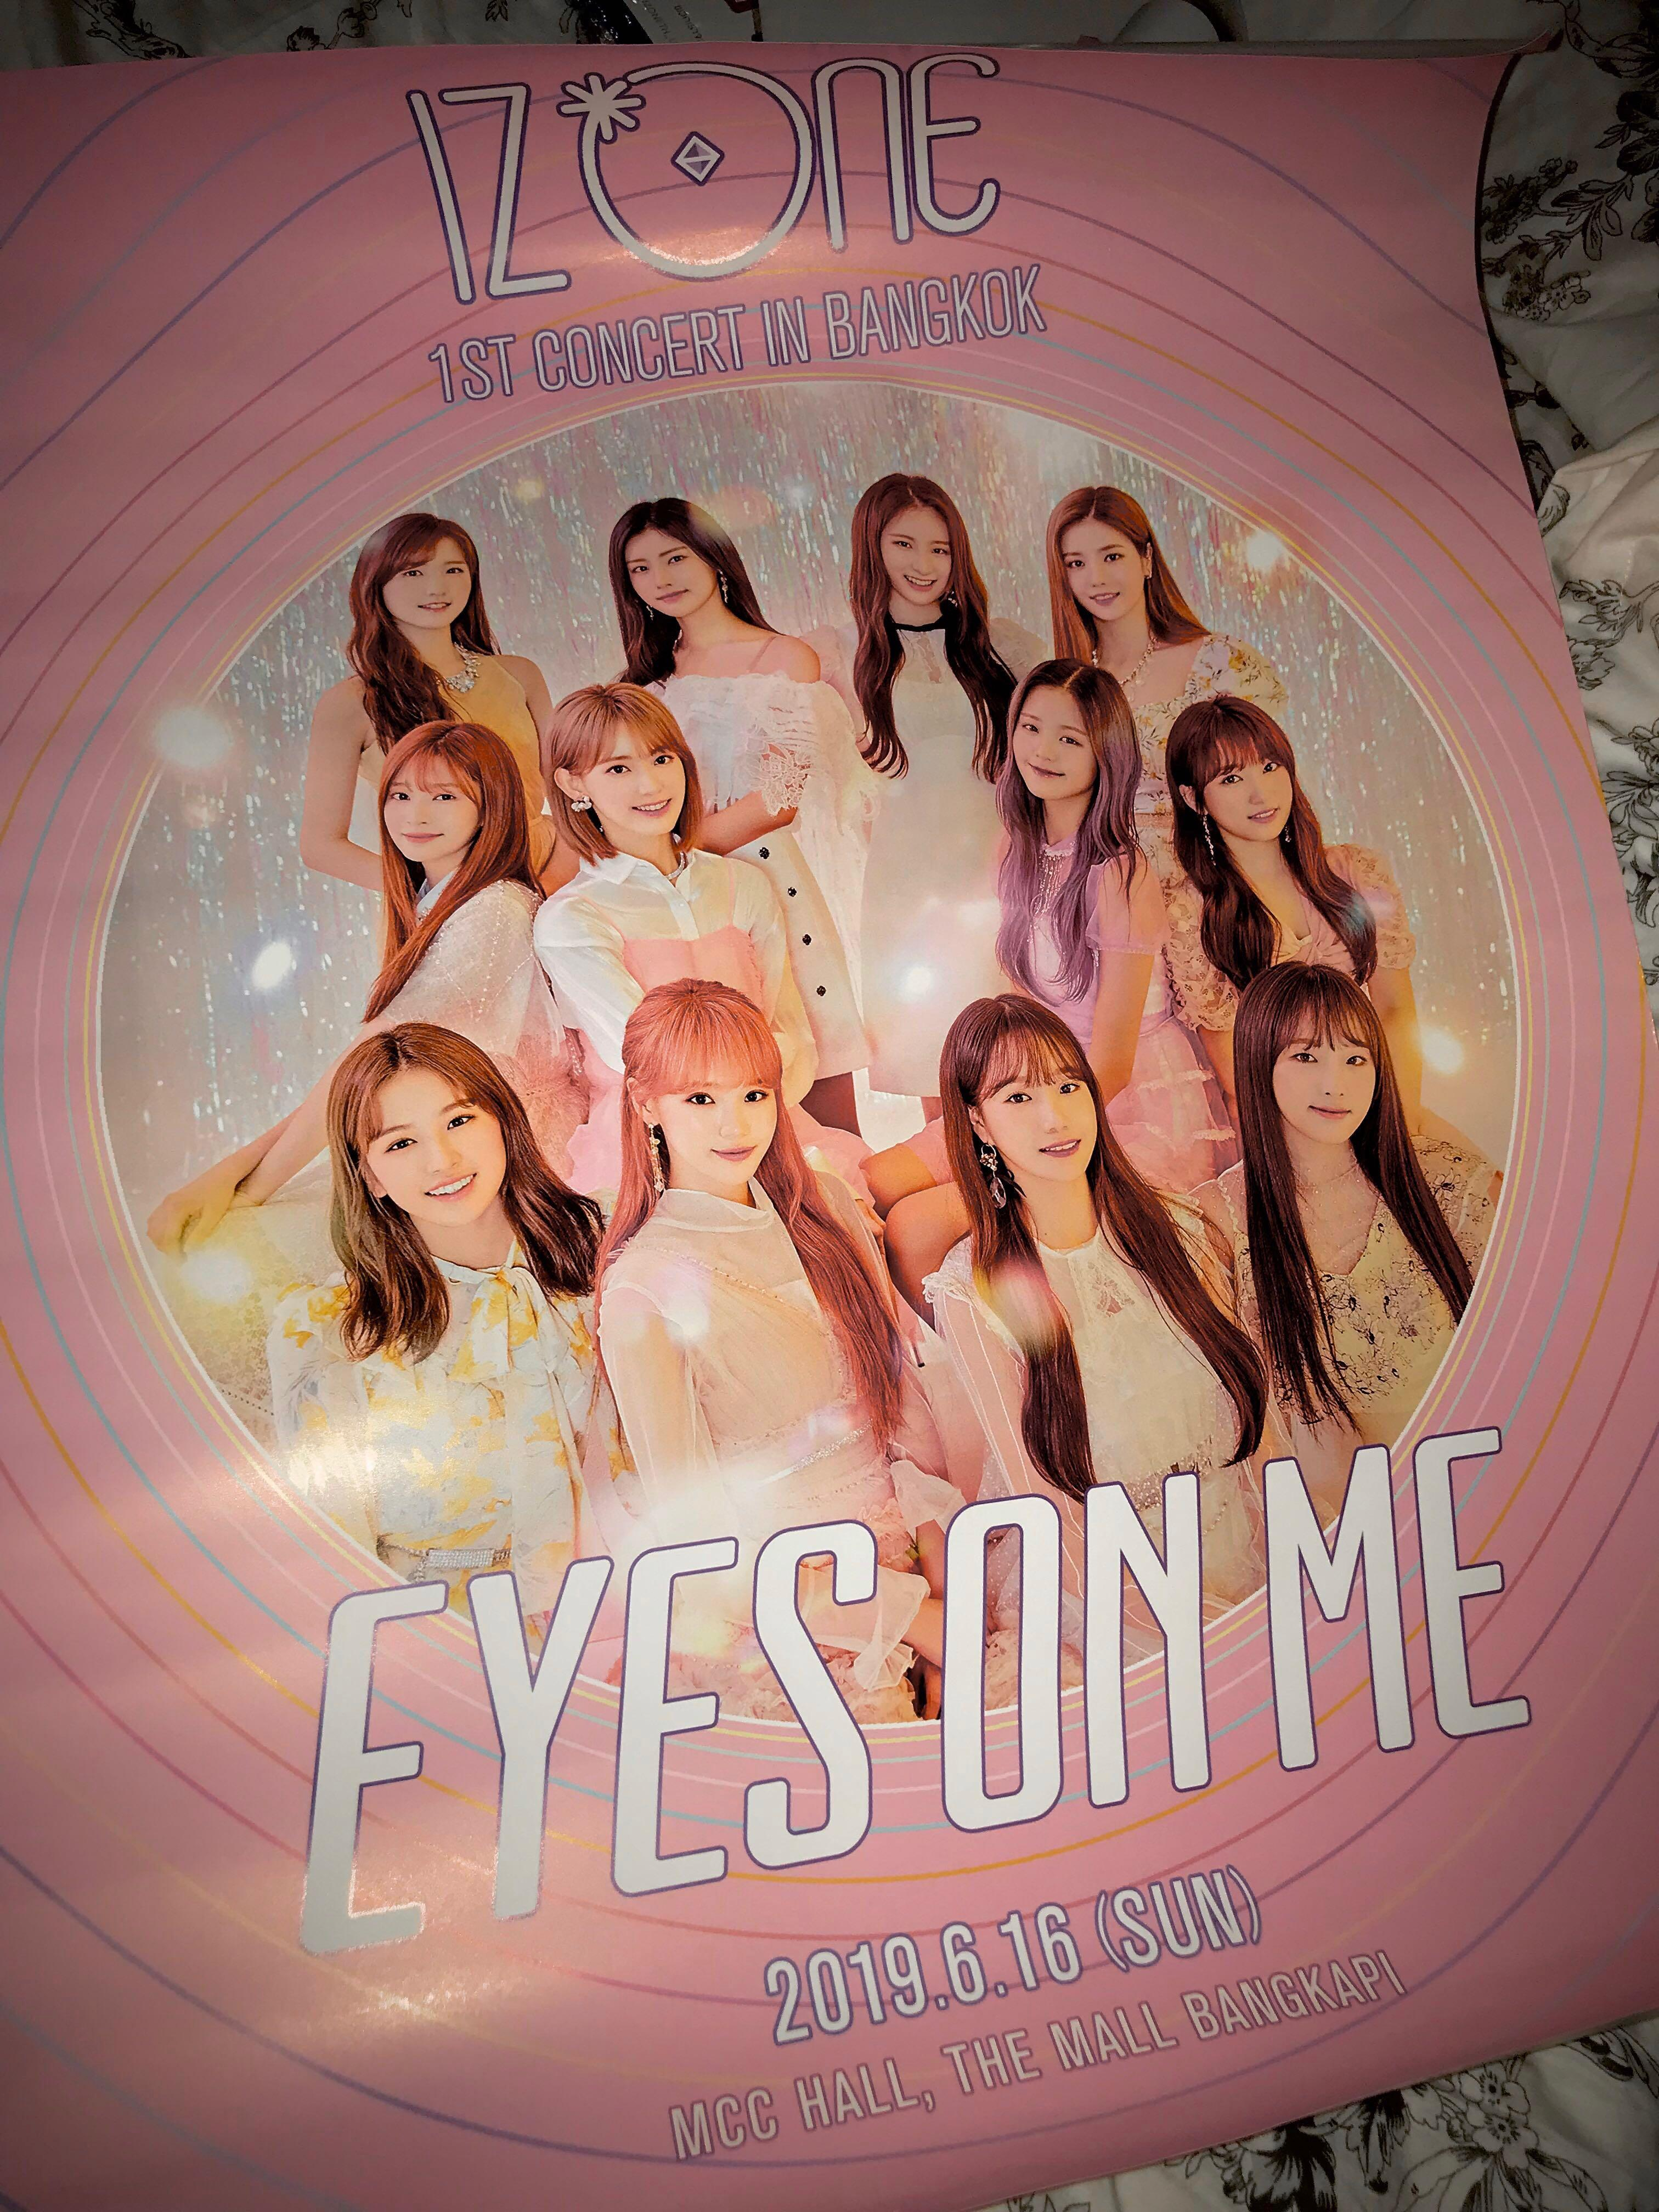 [WTS] IZ*ONE Eyes On Me Bangkok Poster